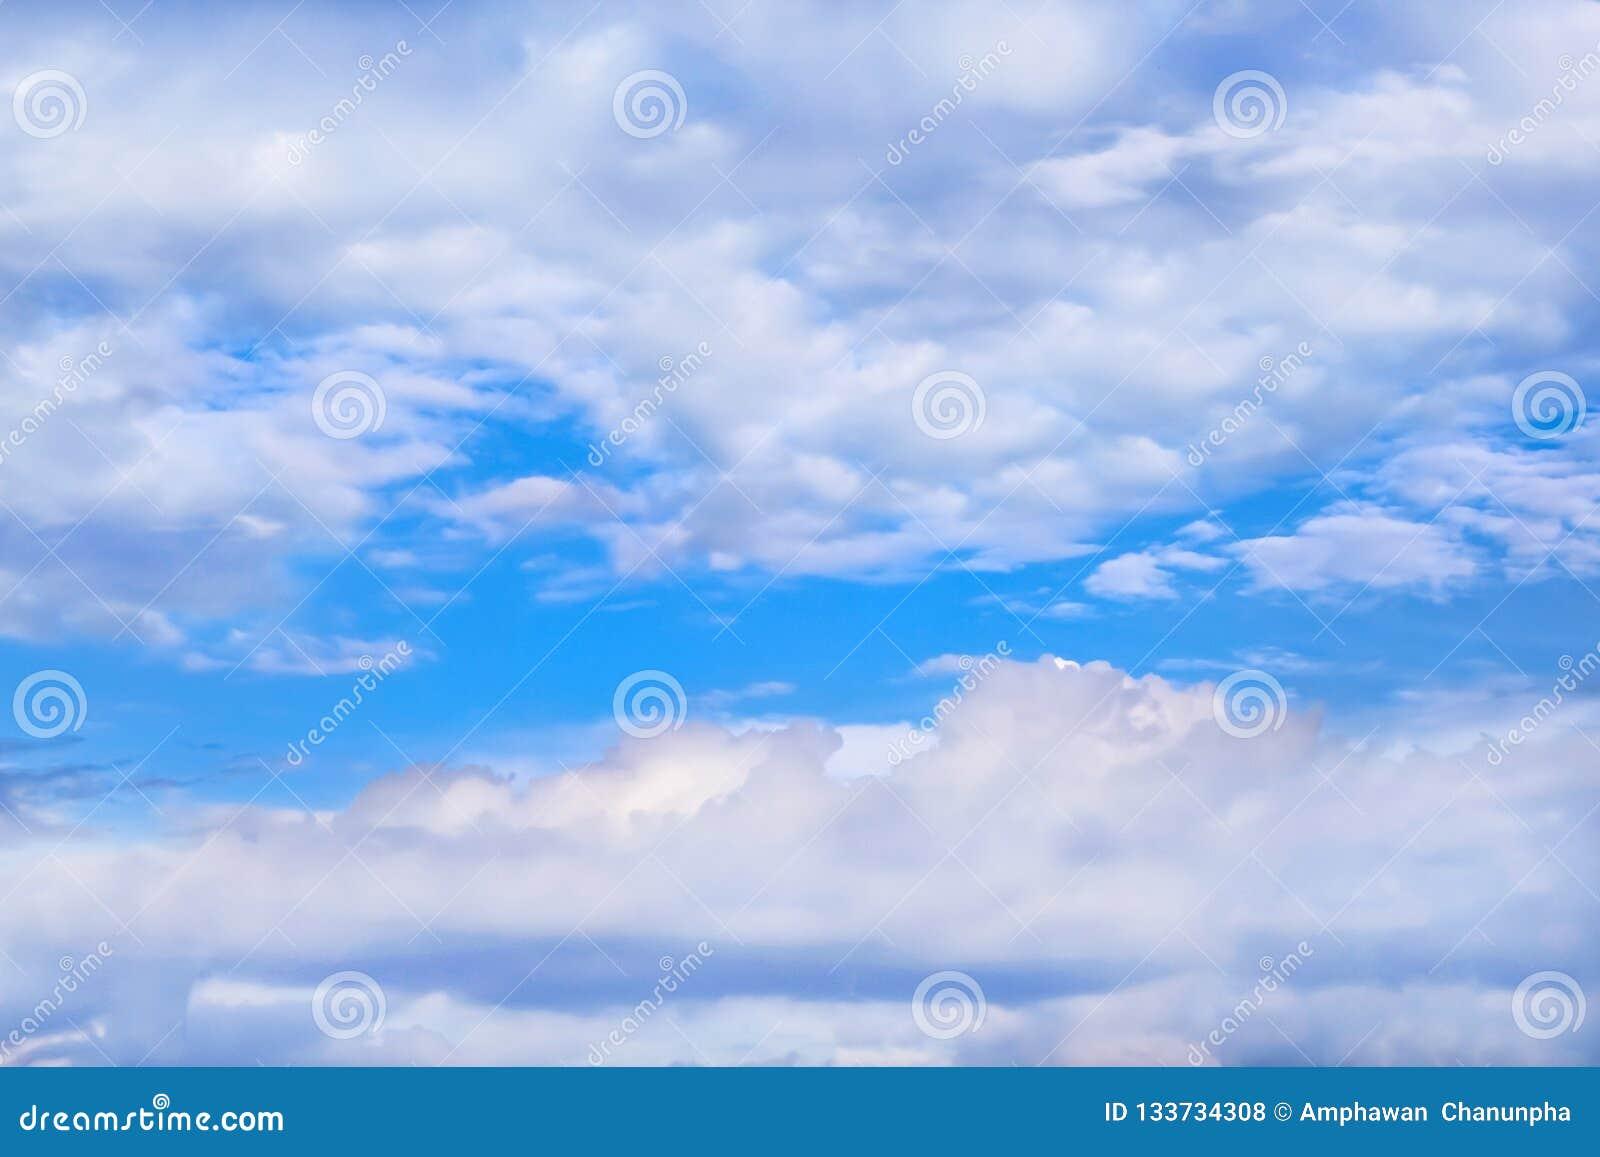 Huge clouds group on blue sky background